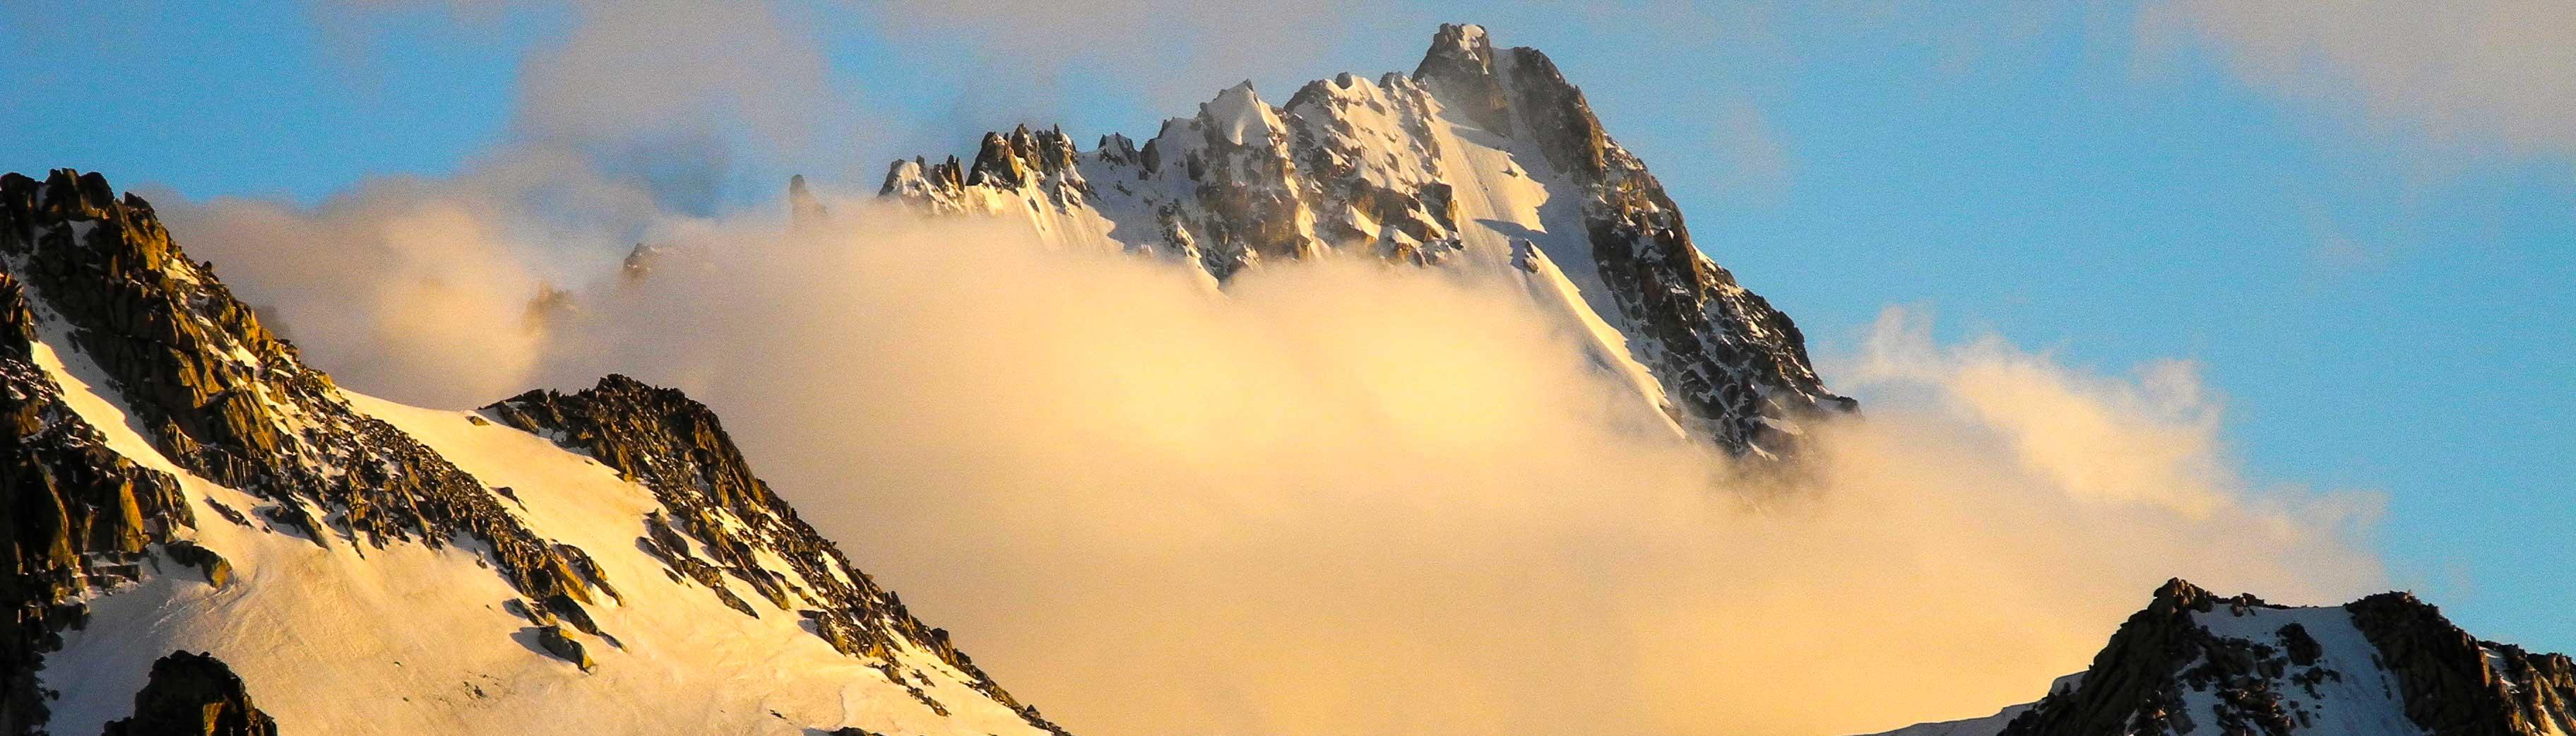 Hochtouren Training Alpen